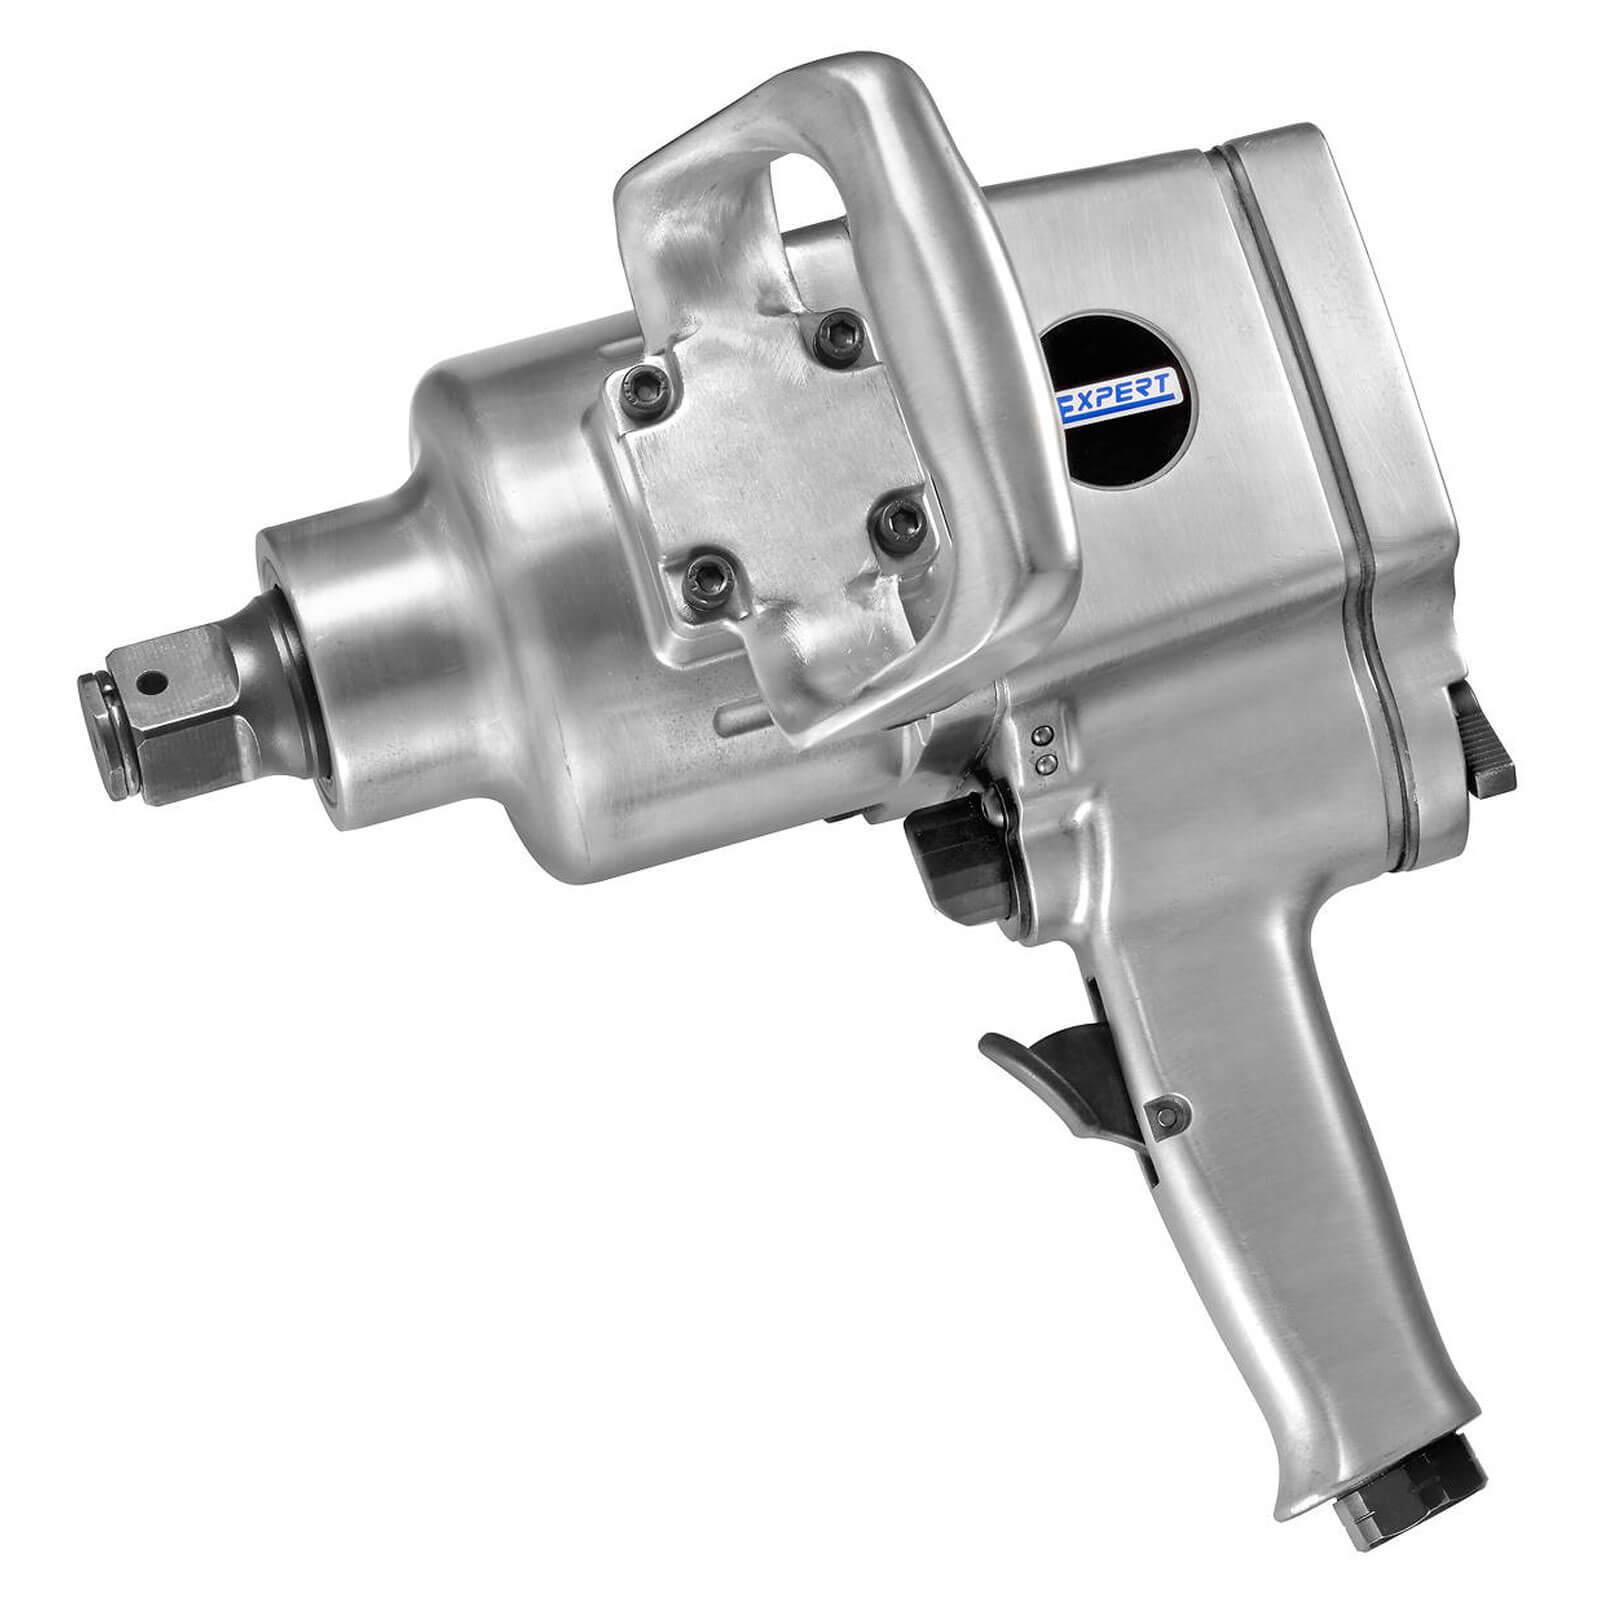 "Britool Expert E230120B 1"" Drive Pistol Air Impact Wrench 2170Nm"